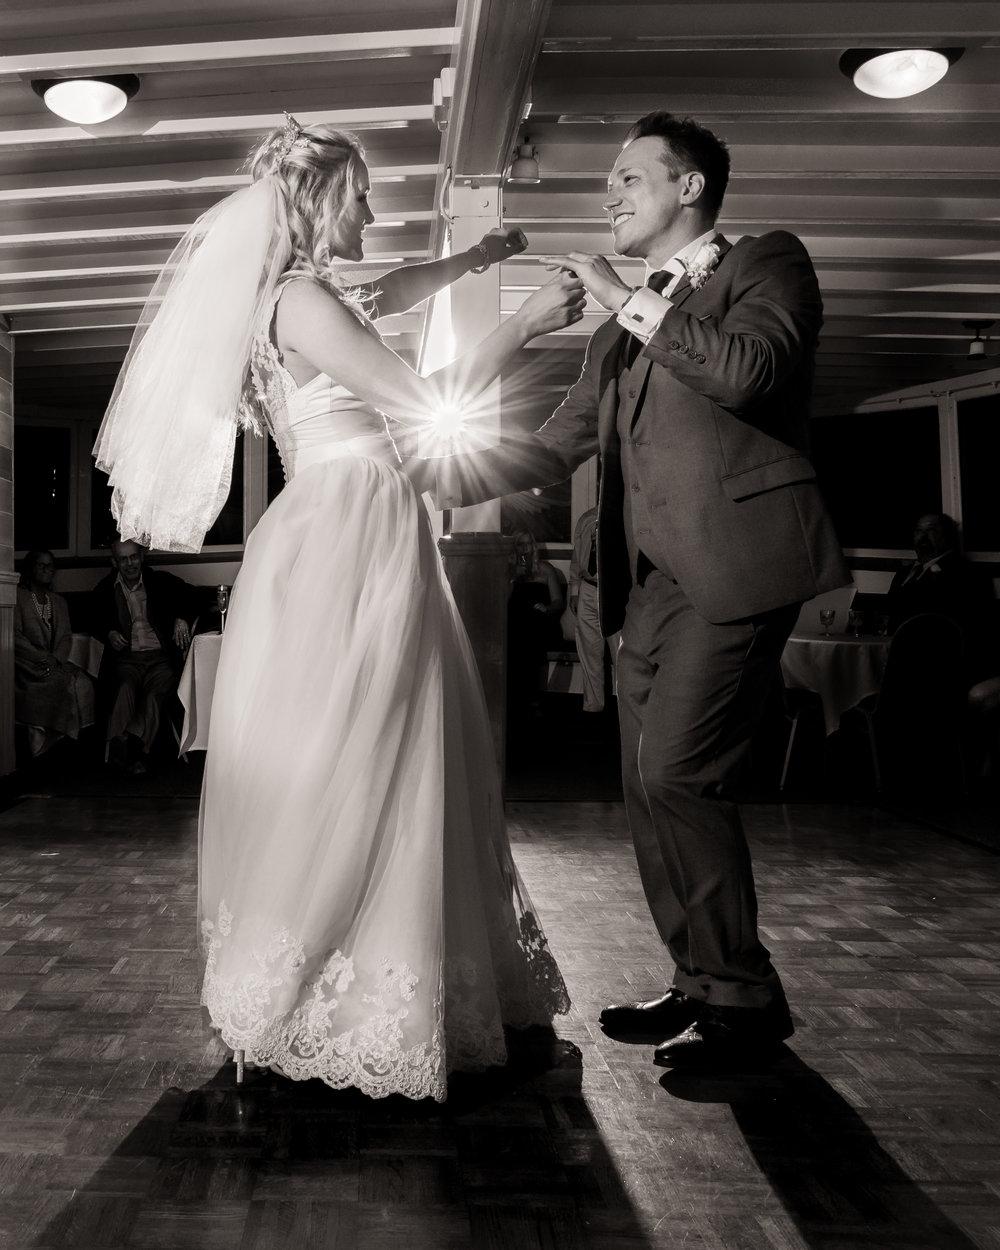 2016_September_04-nomad_lola_wedding_secondshooter-27789.jpg